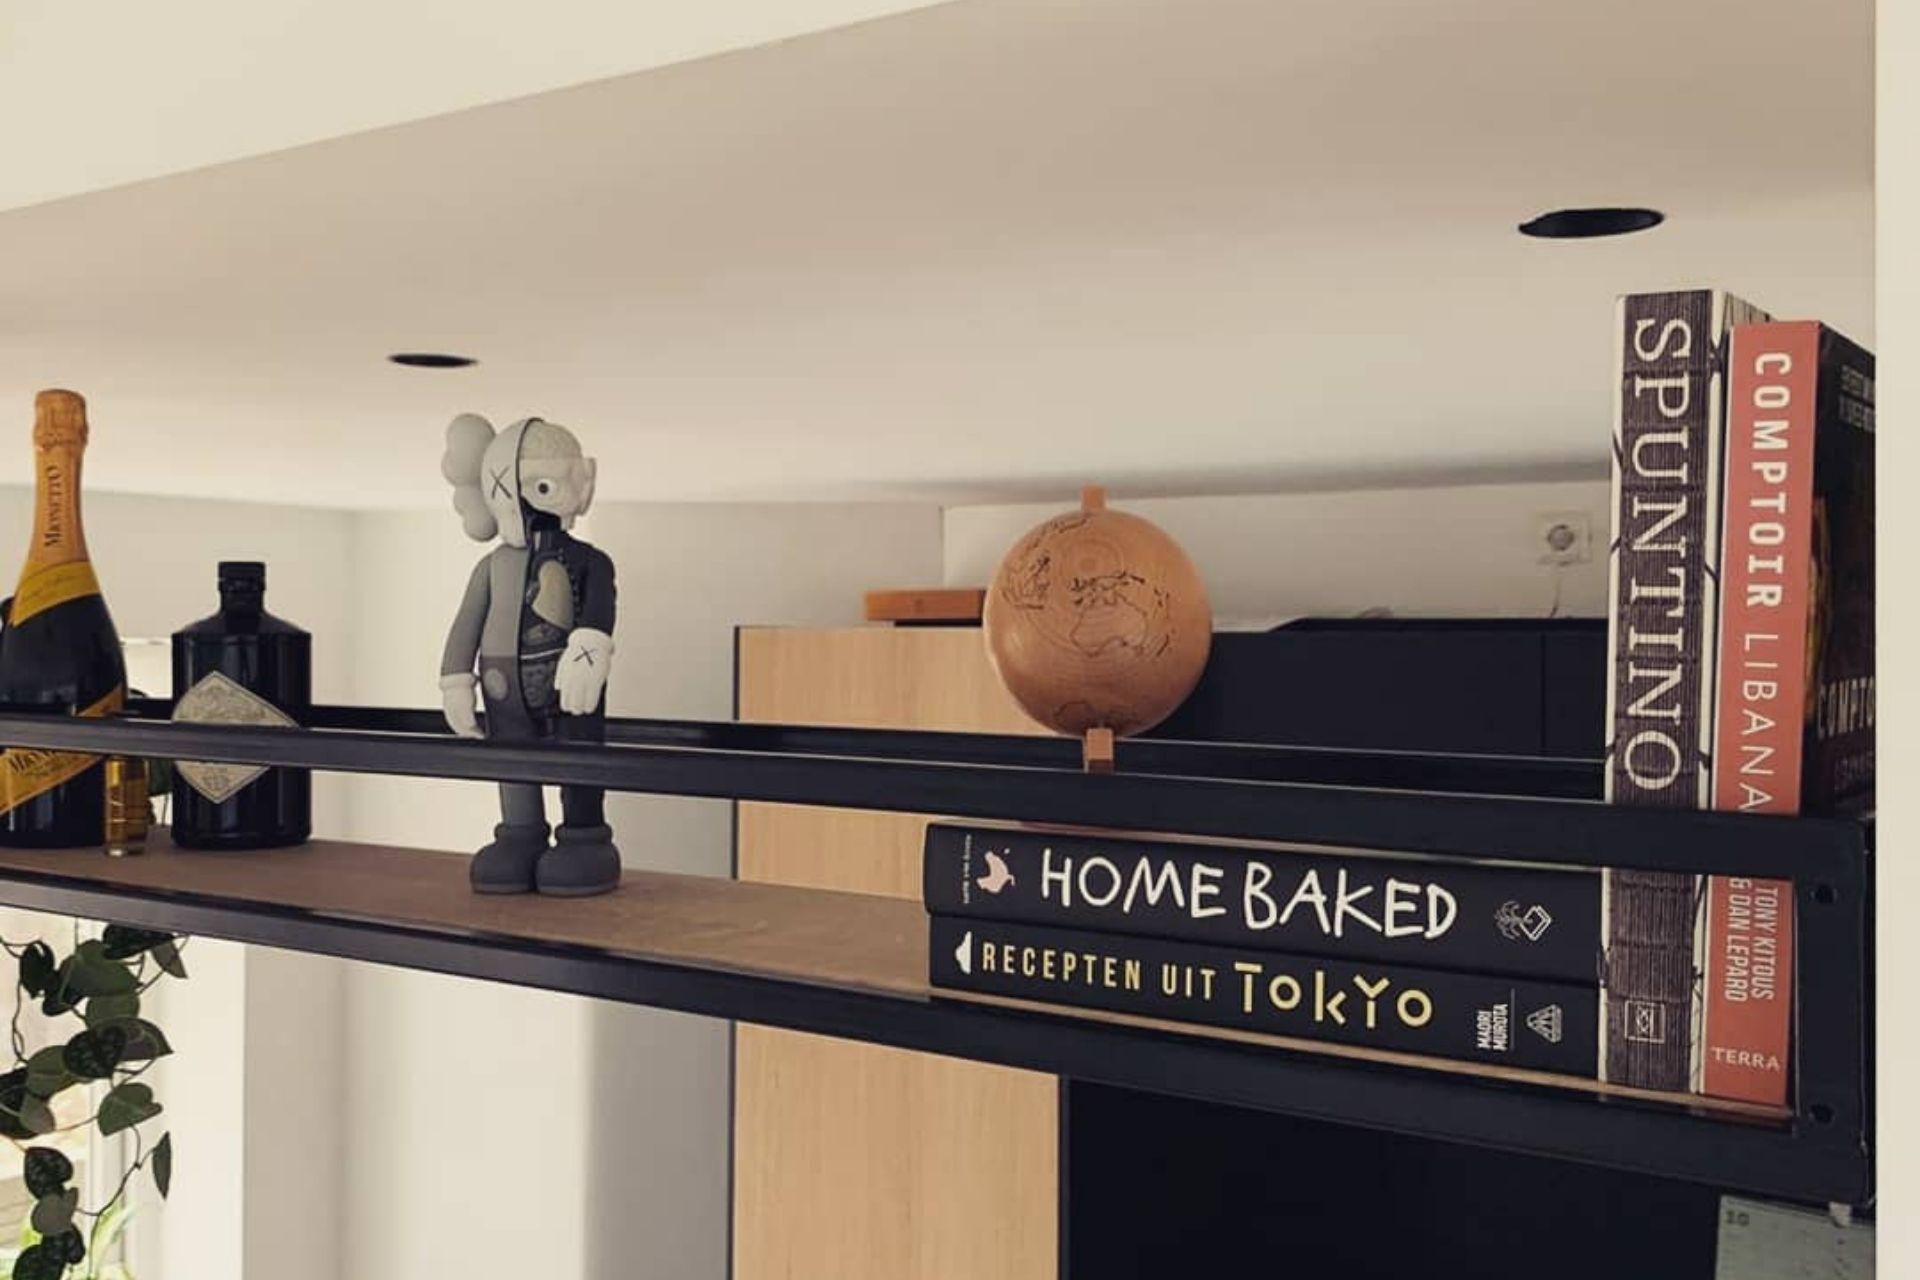 Keukenplankrek_2